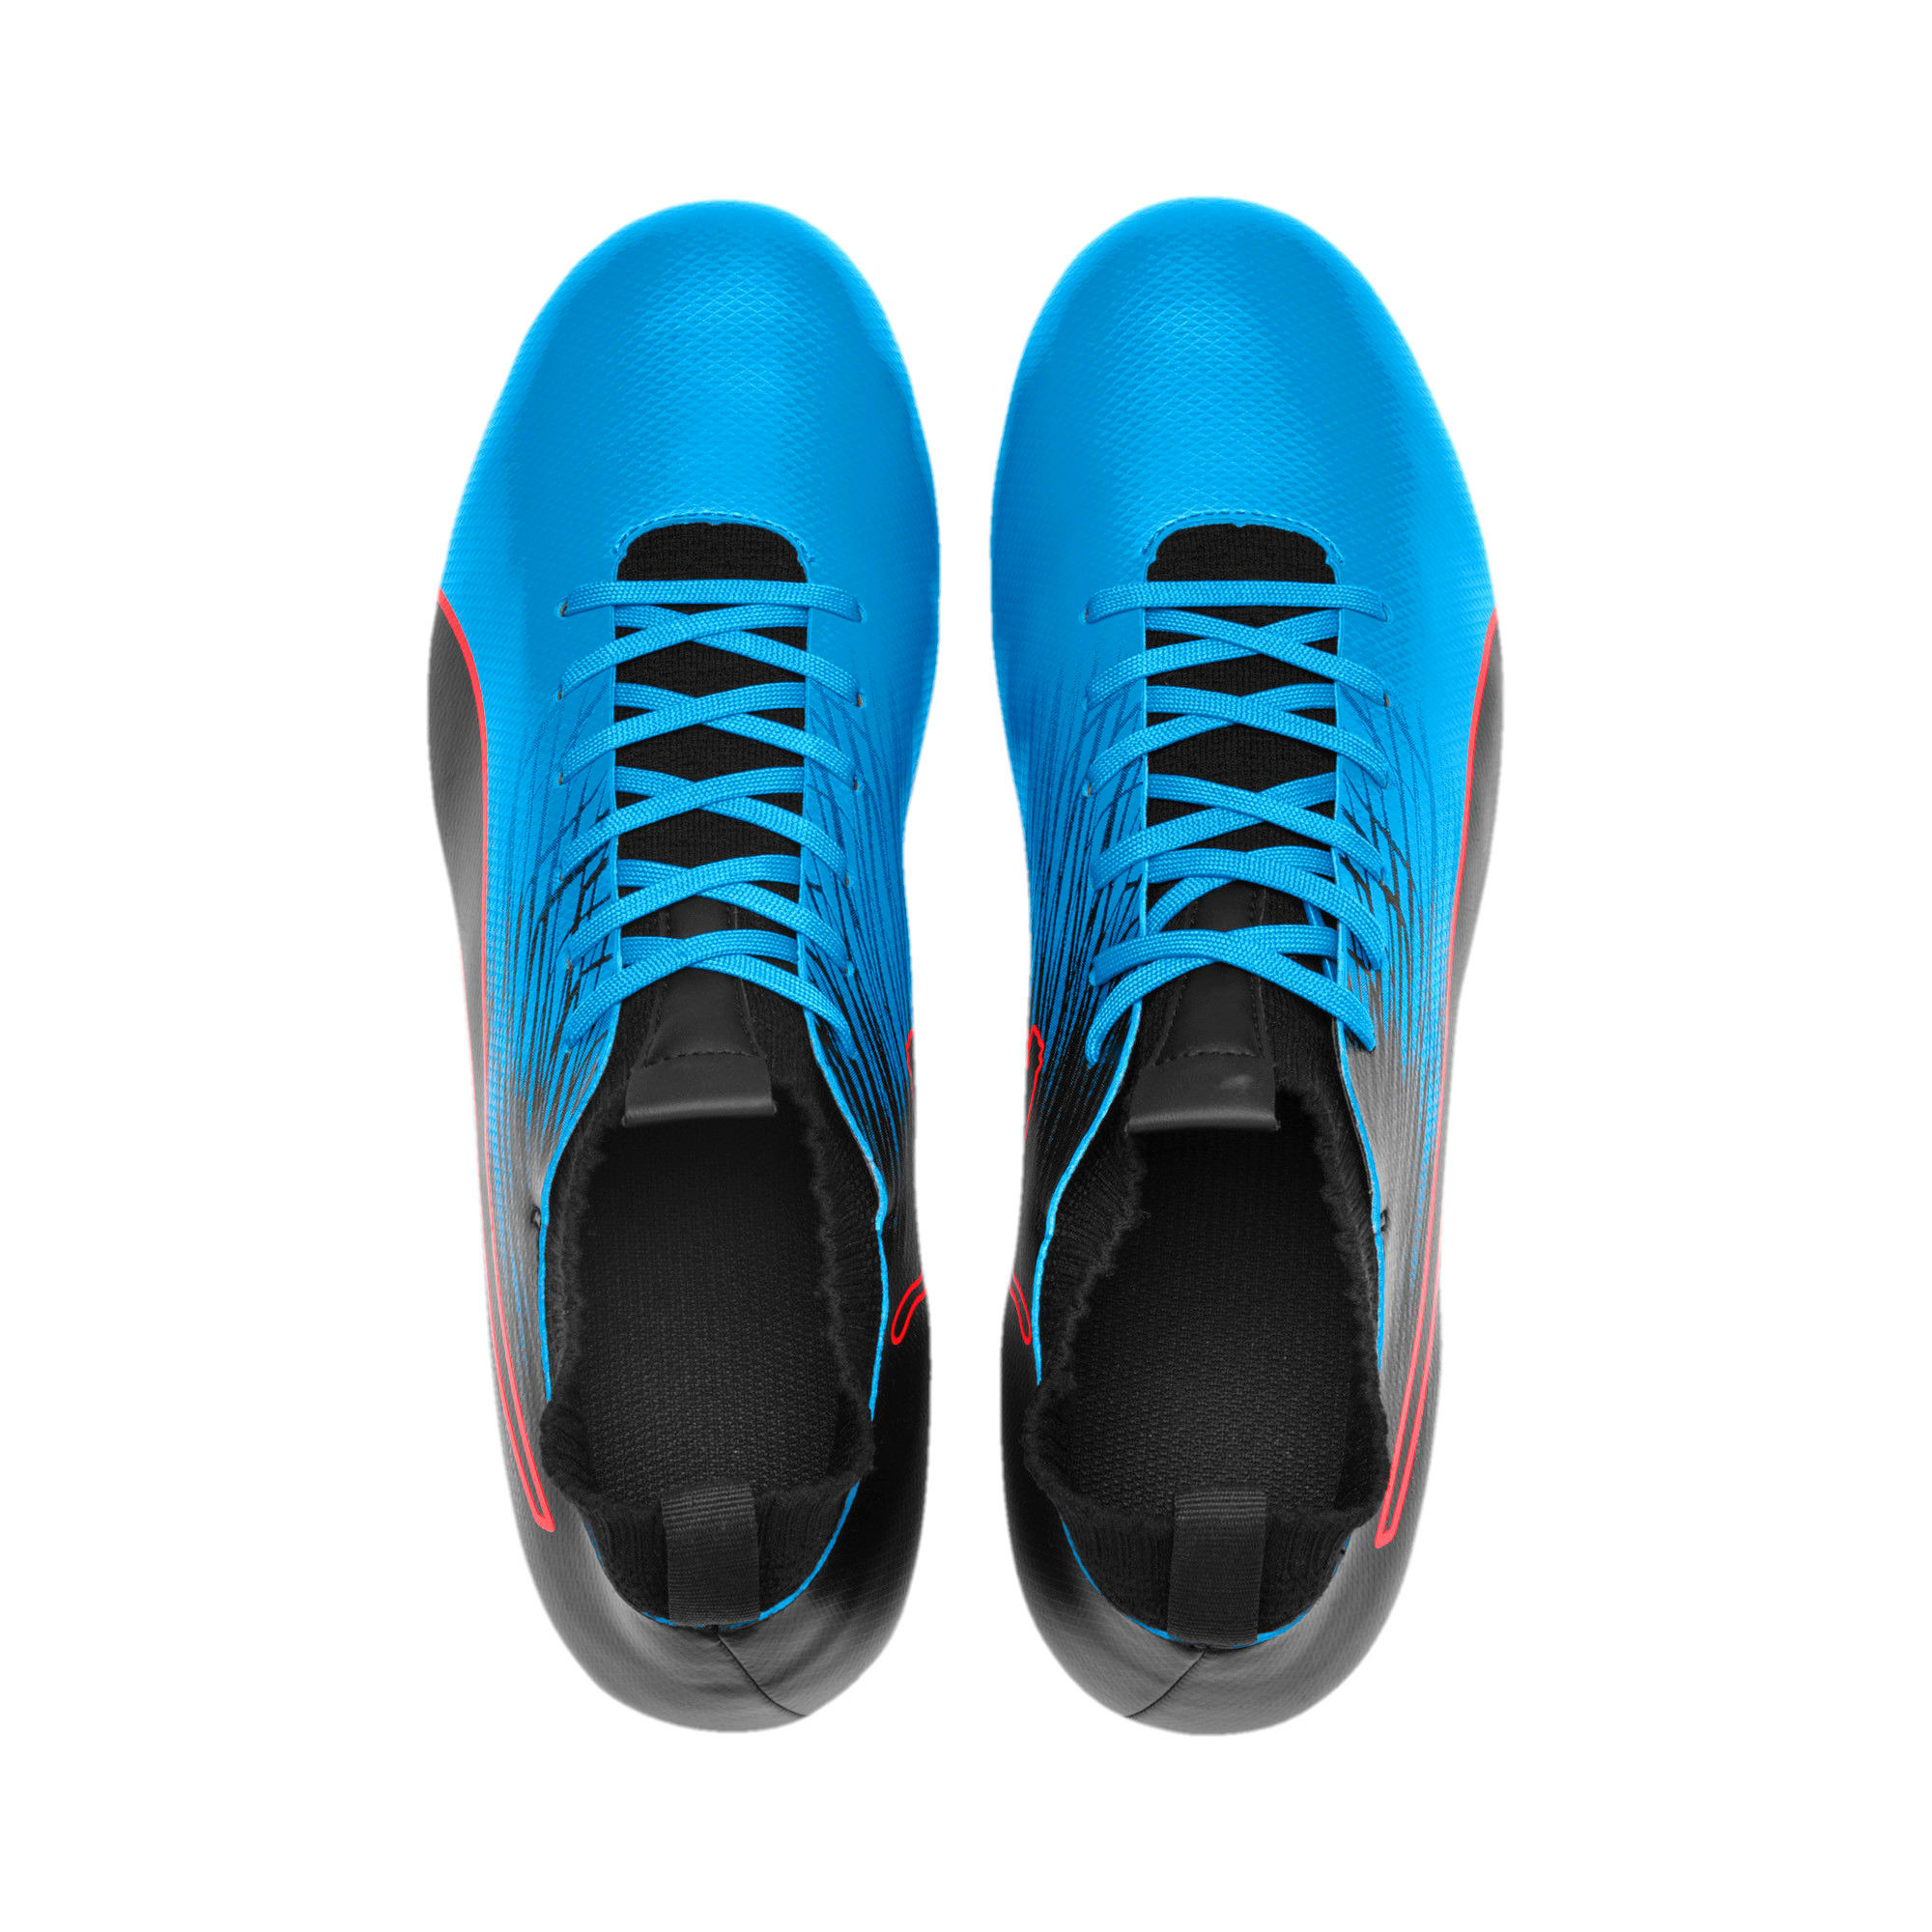 Thumbnail 5 of evoKNIT FTB II FG Men's Football Boots, Bleu Azur-Red Blast-Black, medium-IND